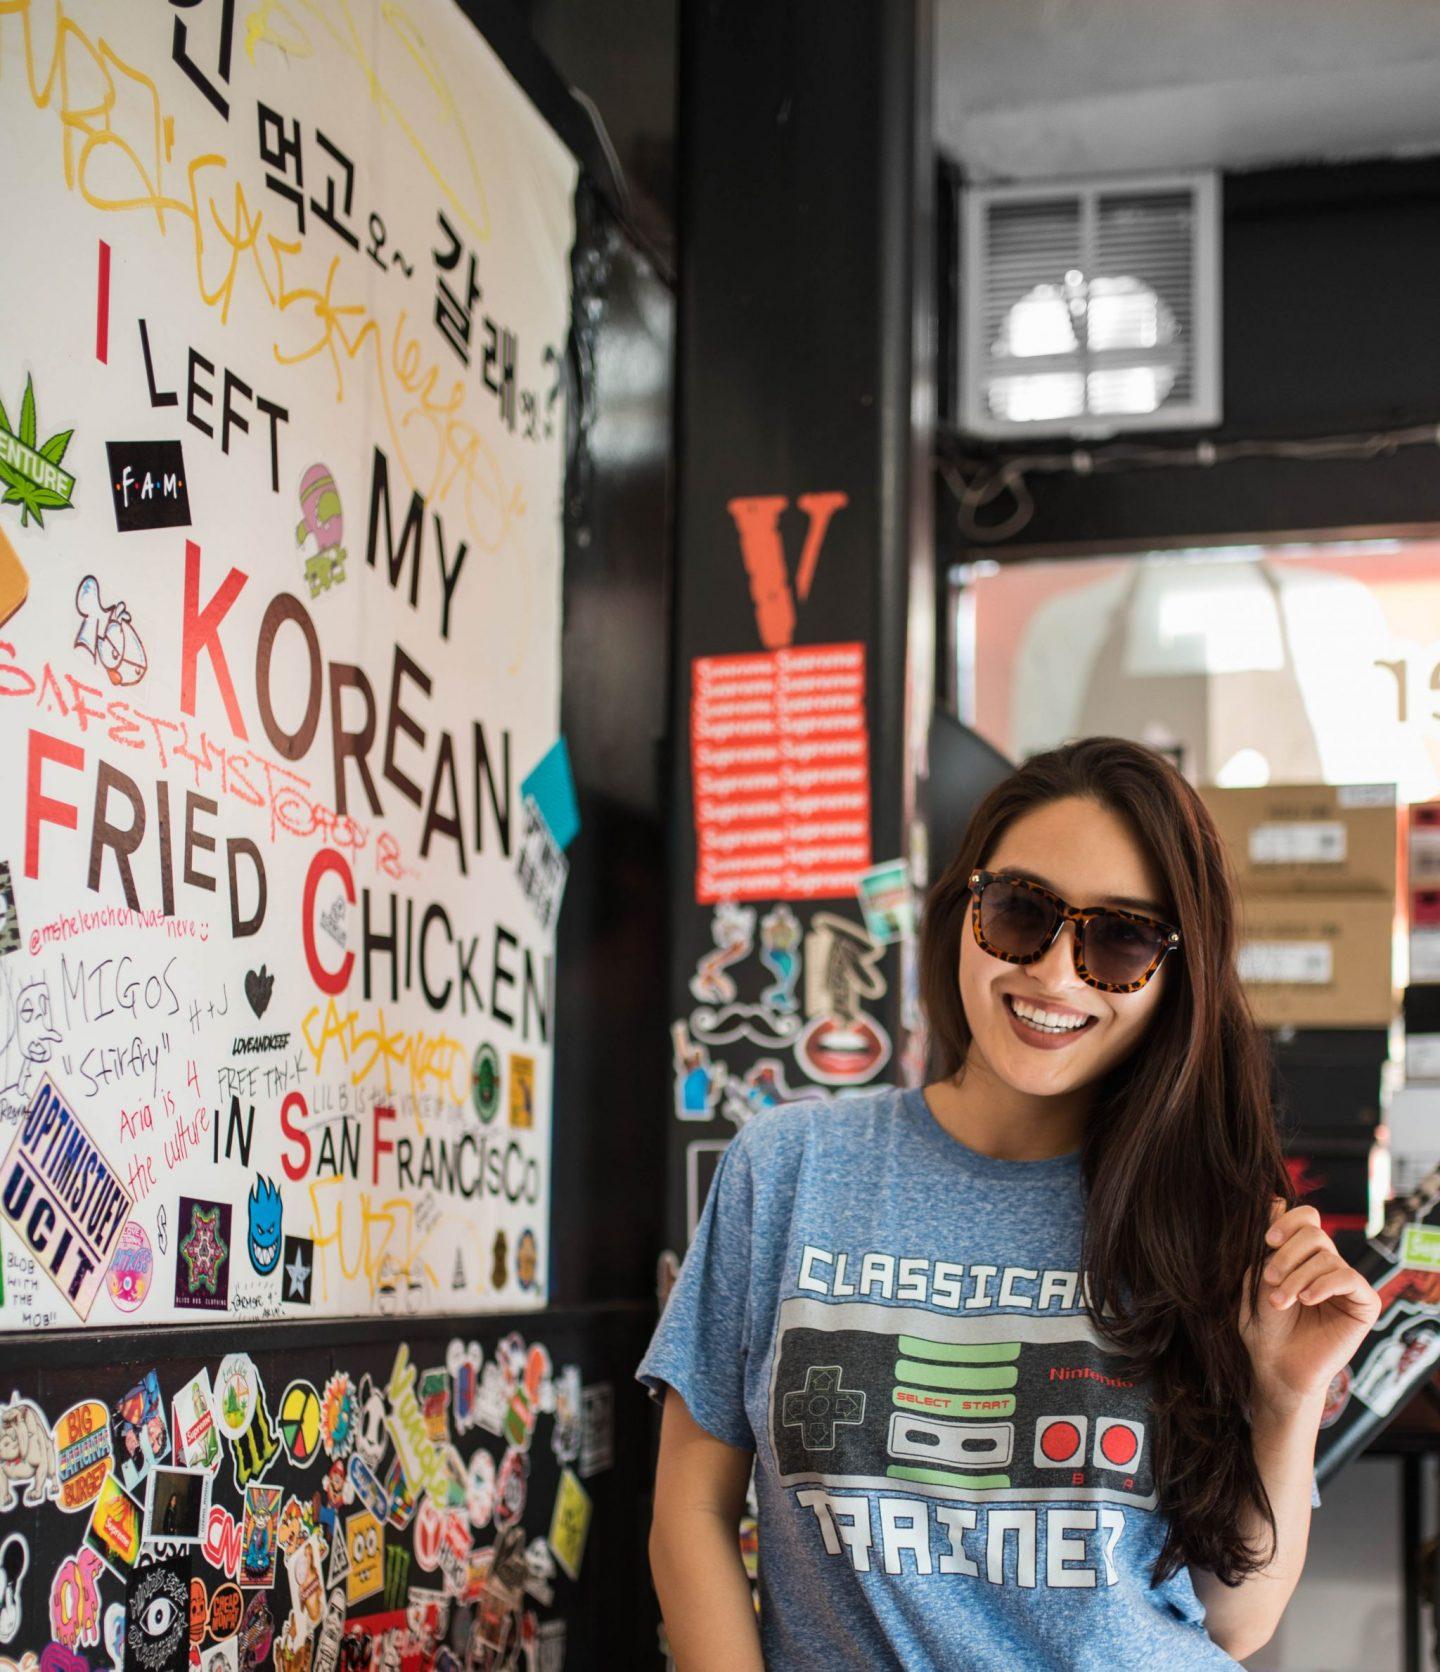 aria korean fried chicken in sf